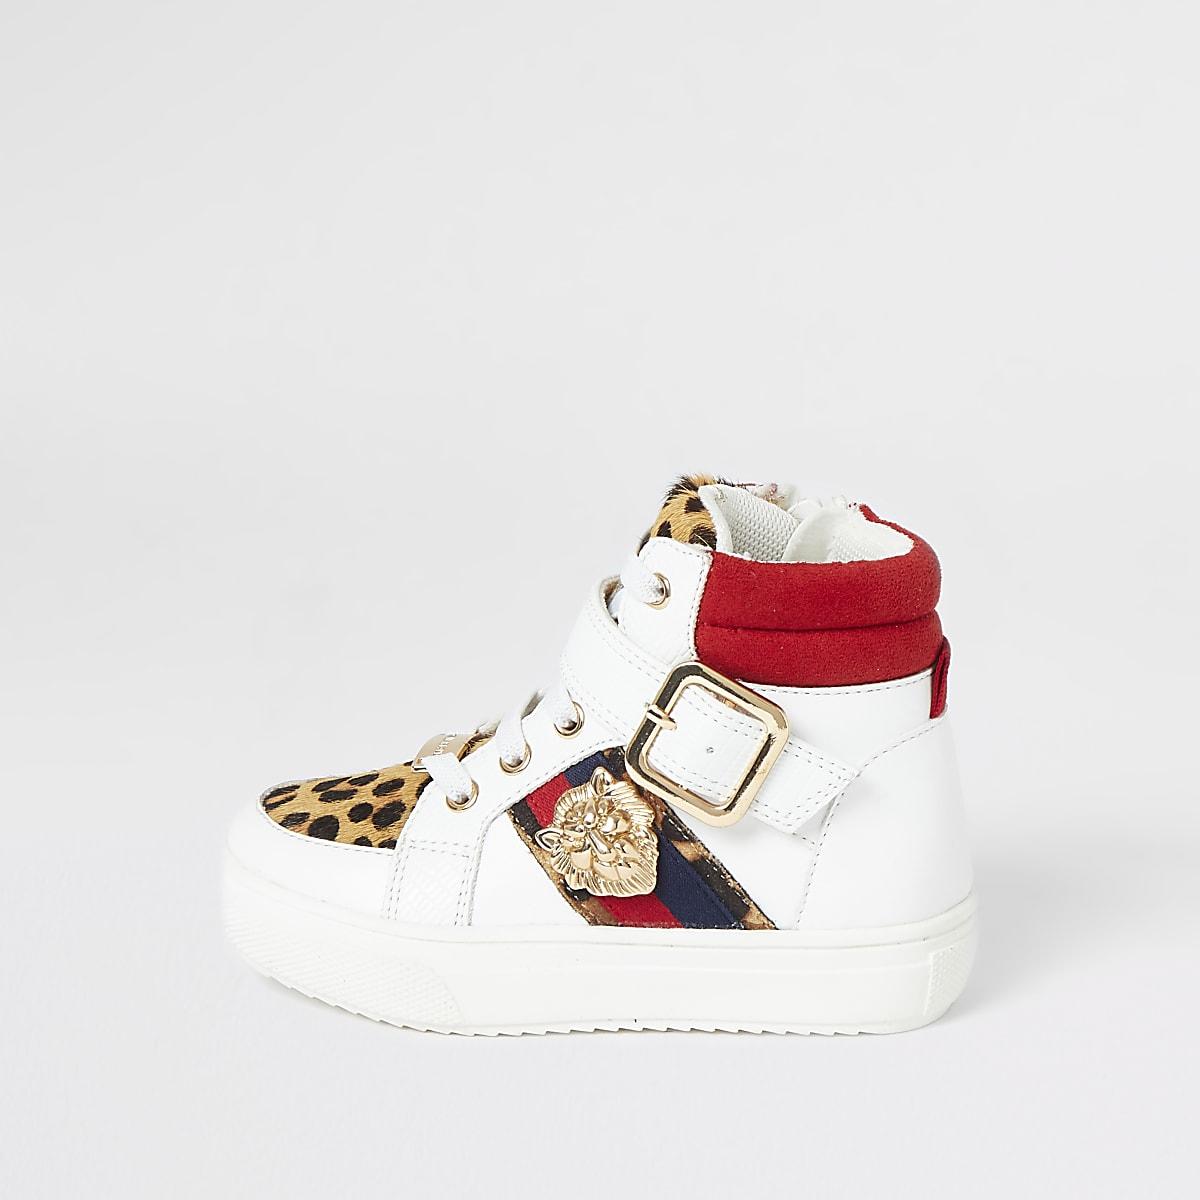 Hoge sneakers met luipaardprint voor mini girls